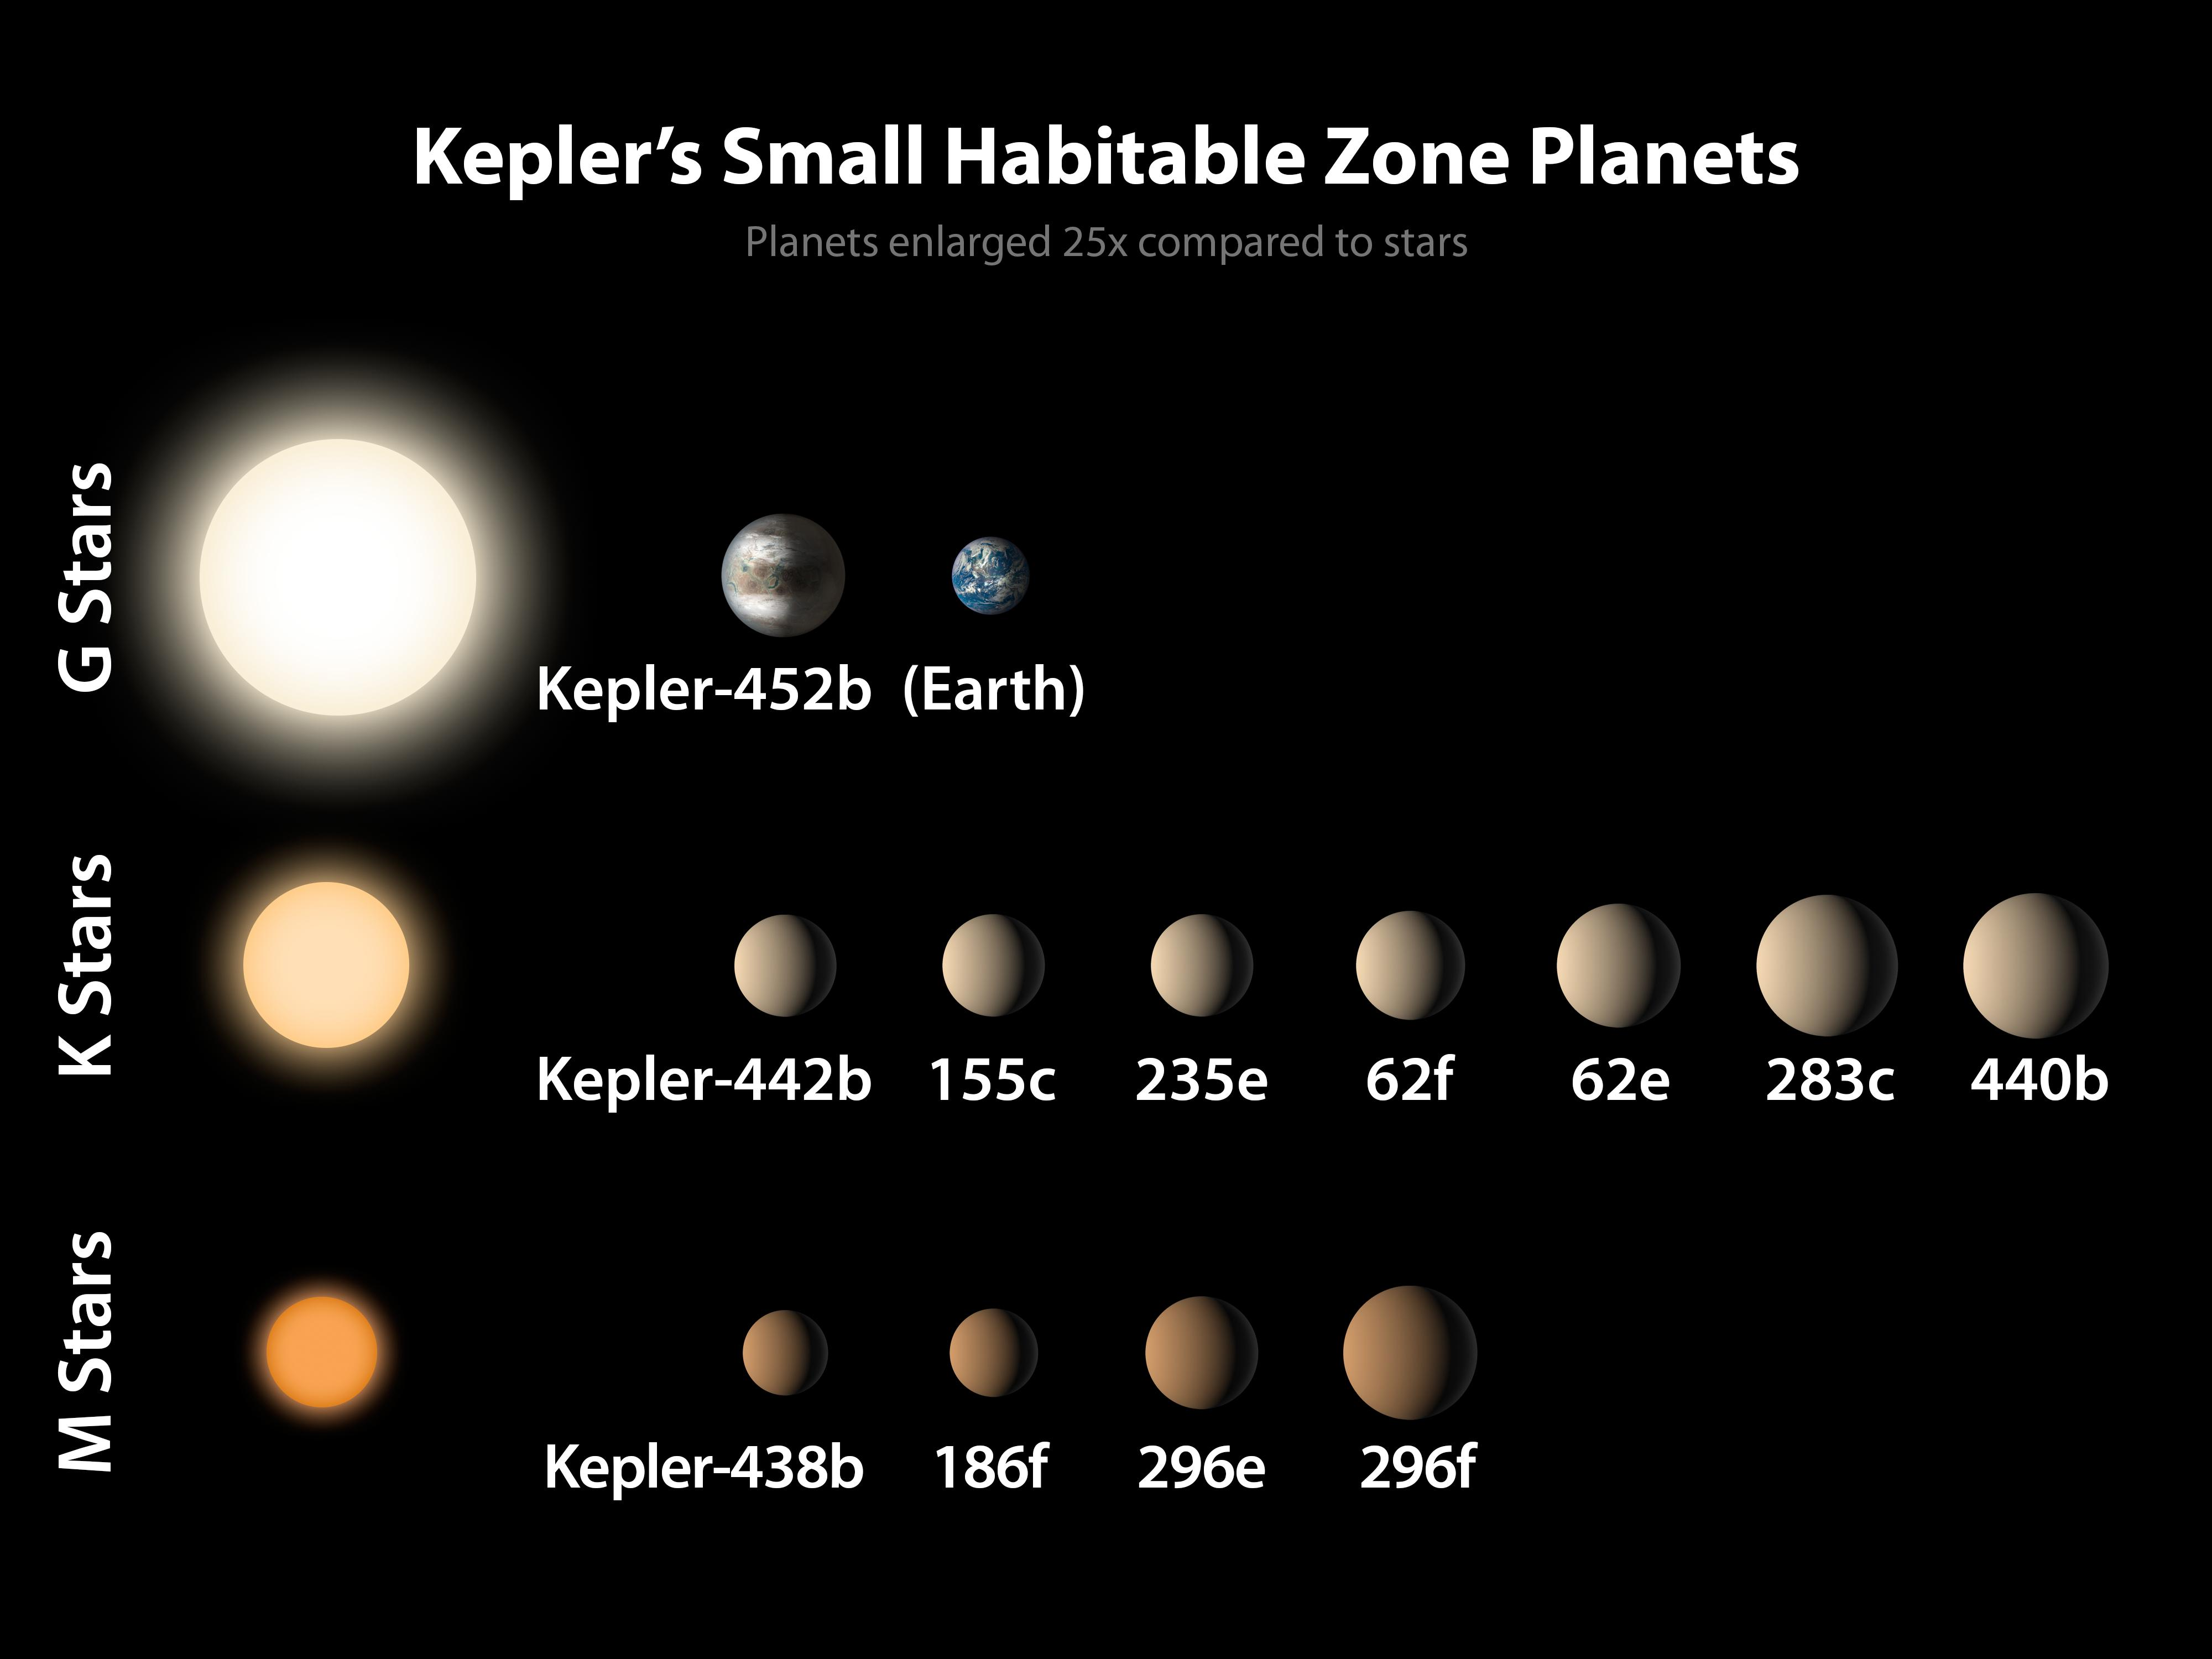 PIA19827-Kepler-SmallPlanets-HabitableZone-20150723